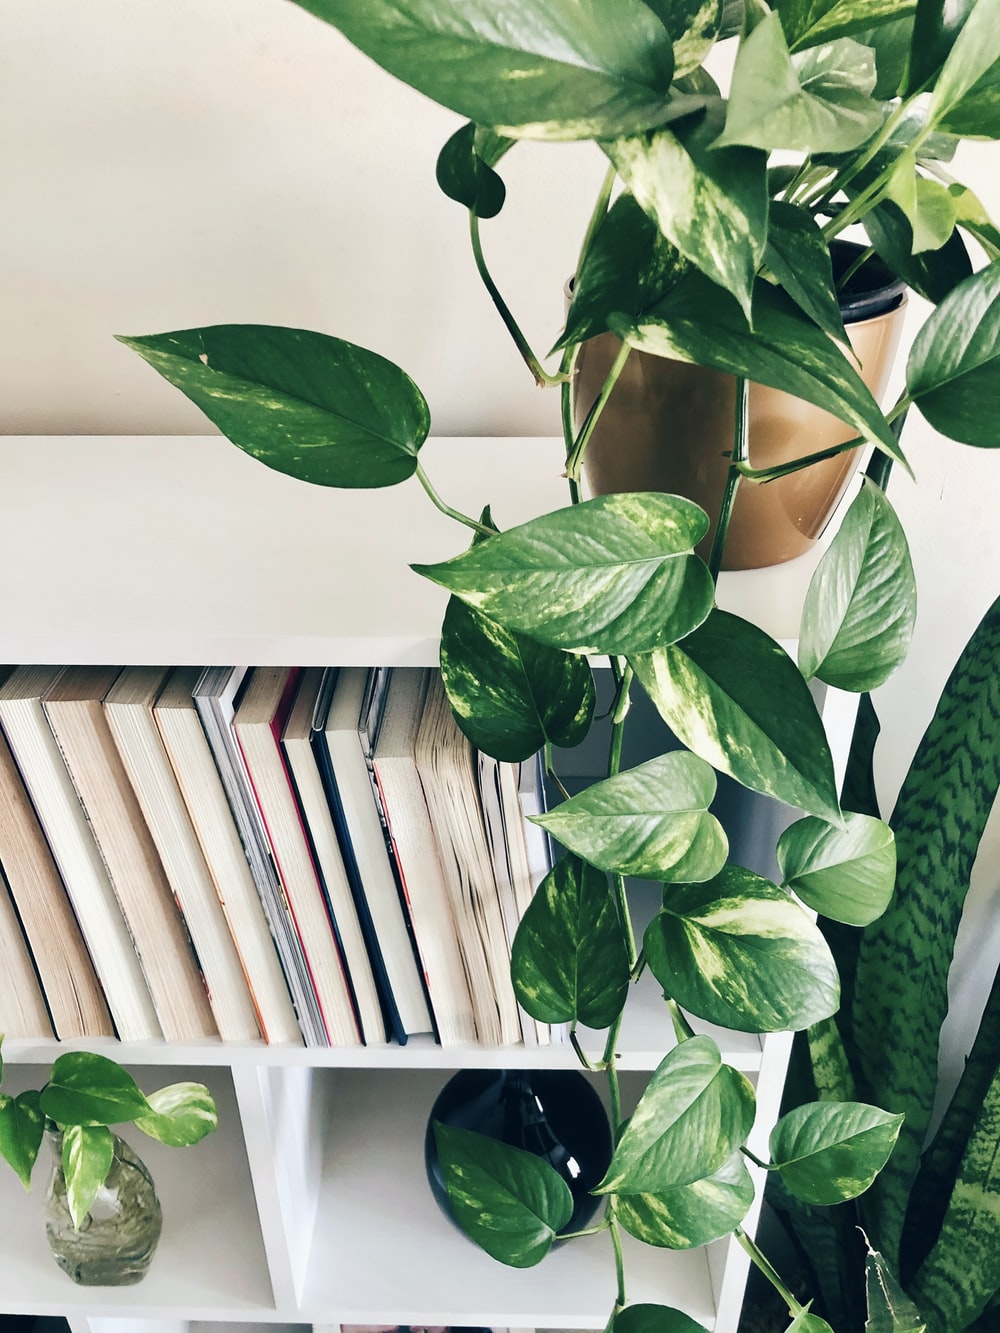 green plant beside white wooden book shelf